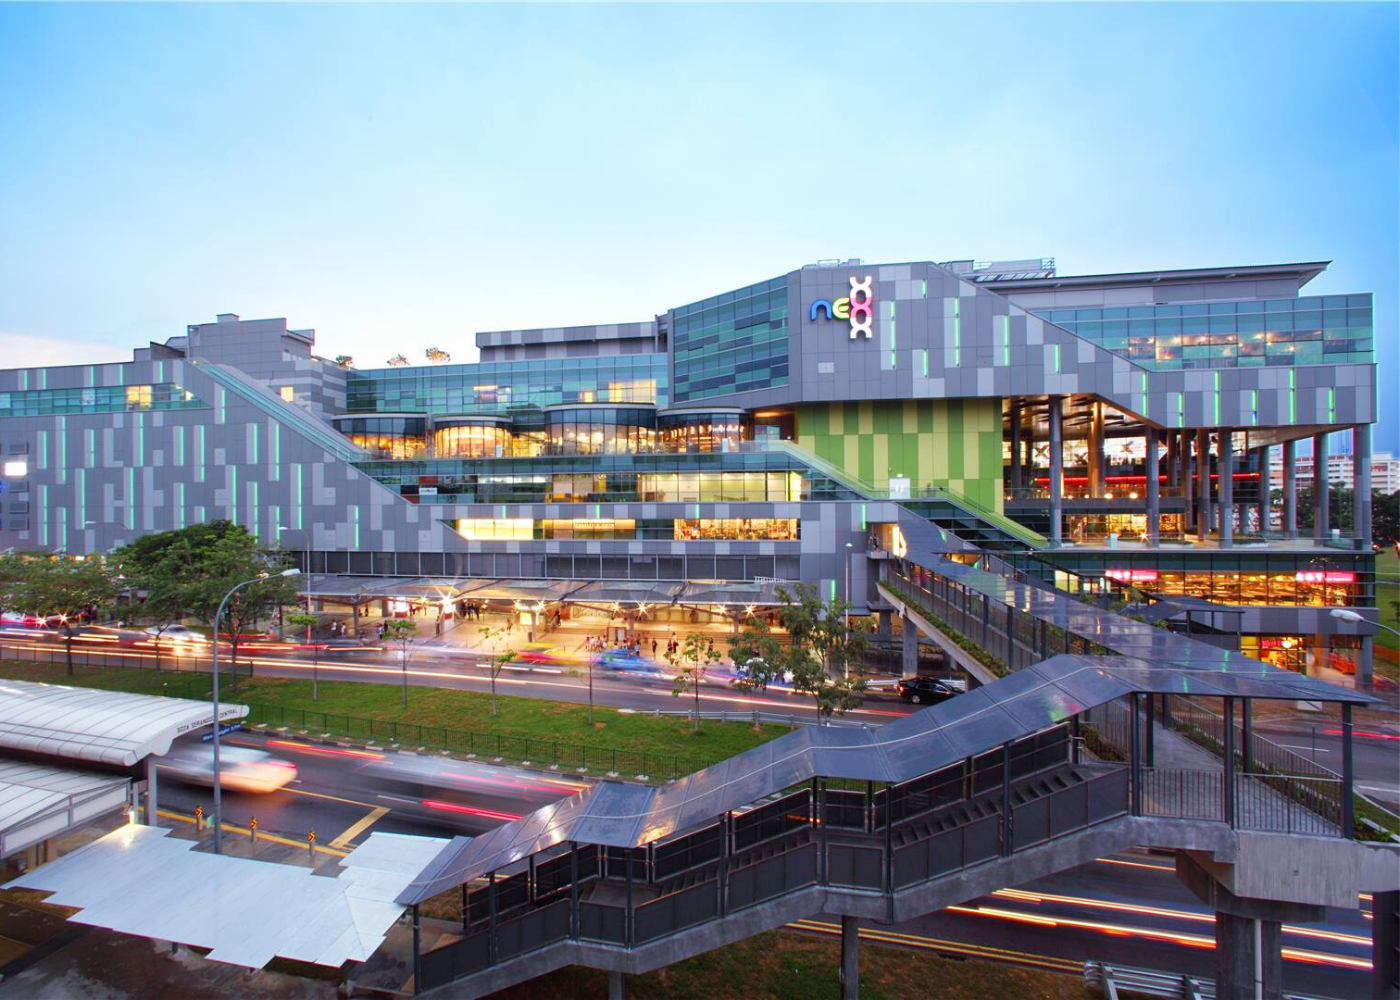 NEX | best shopping malls in Singapore